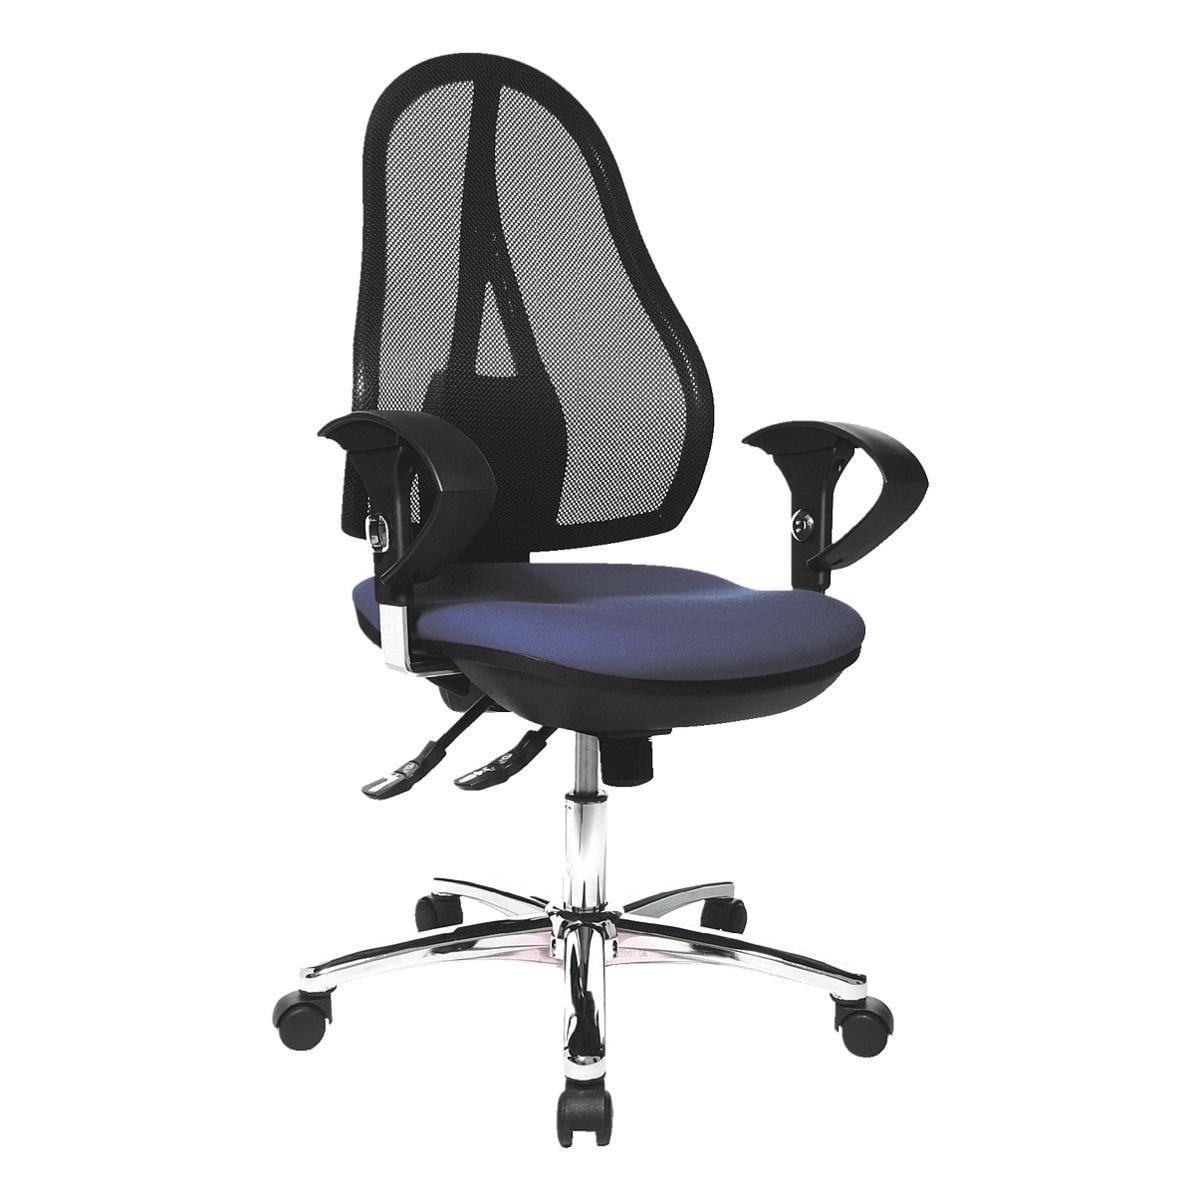 chaise / siège de bureau Topstar »Open Point SY Deluxe« avec accoudoirs